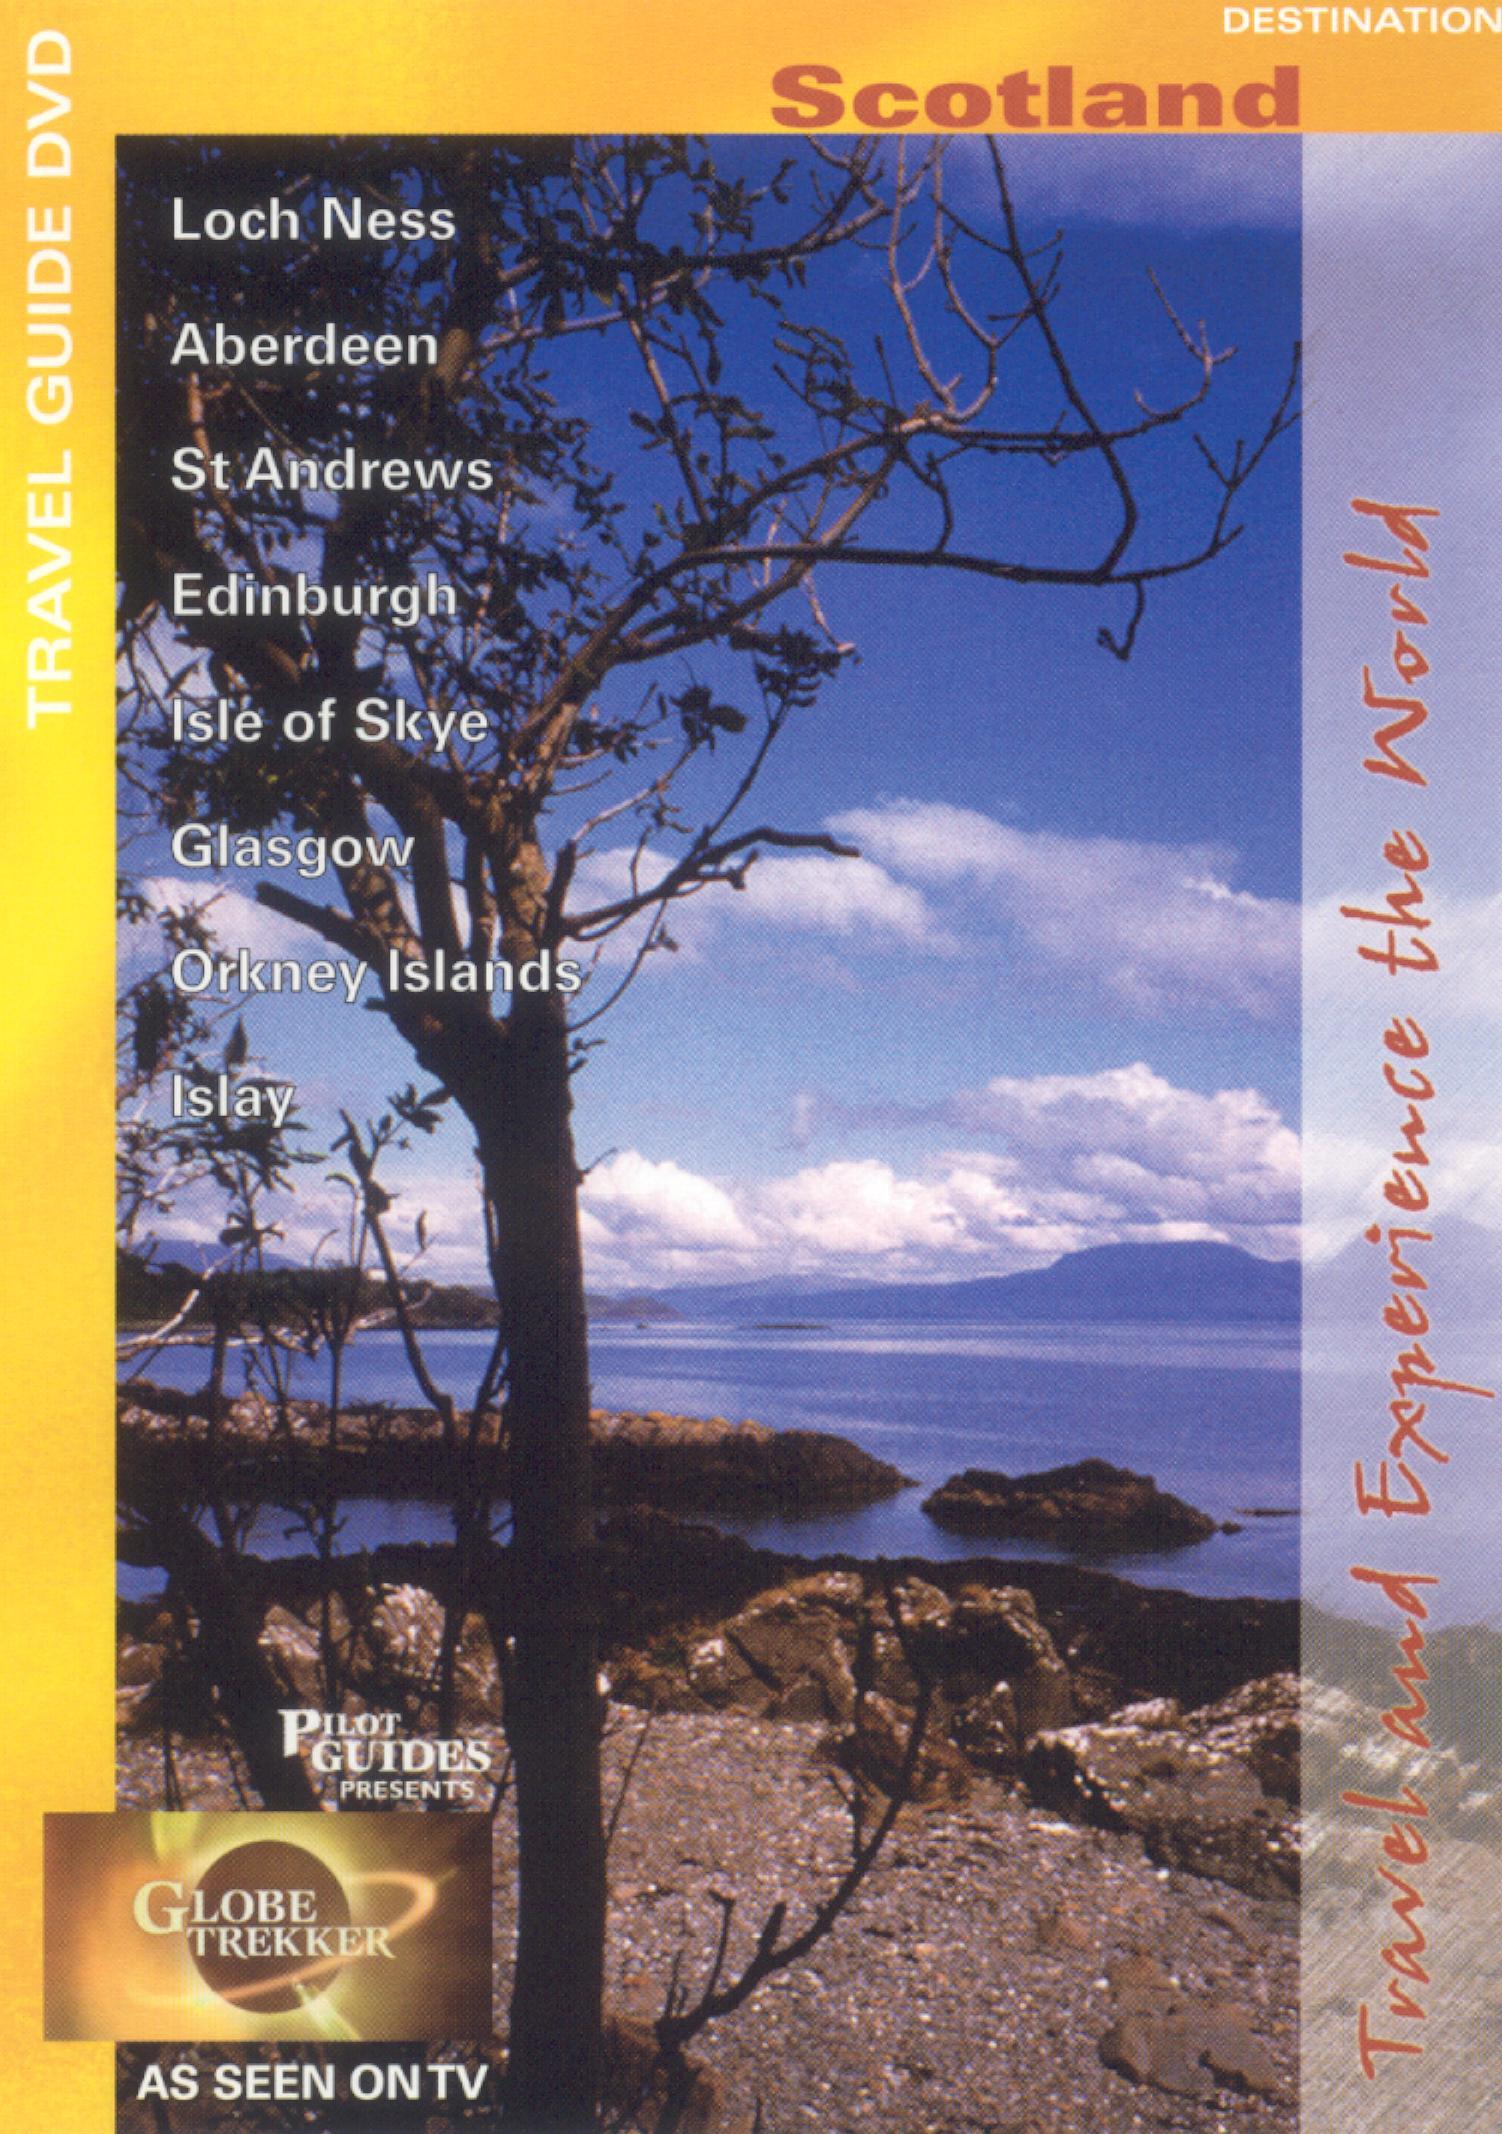 Globe Trekker: Scotland